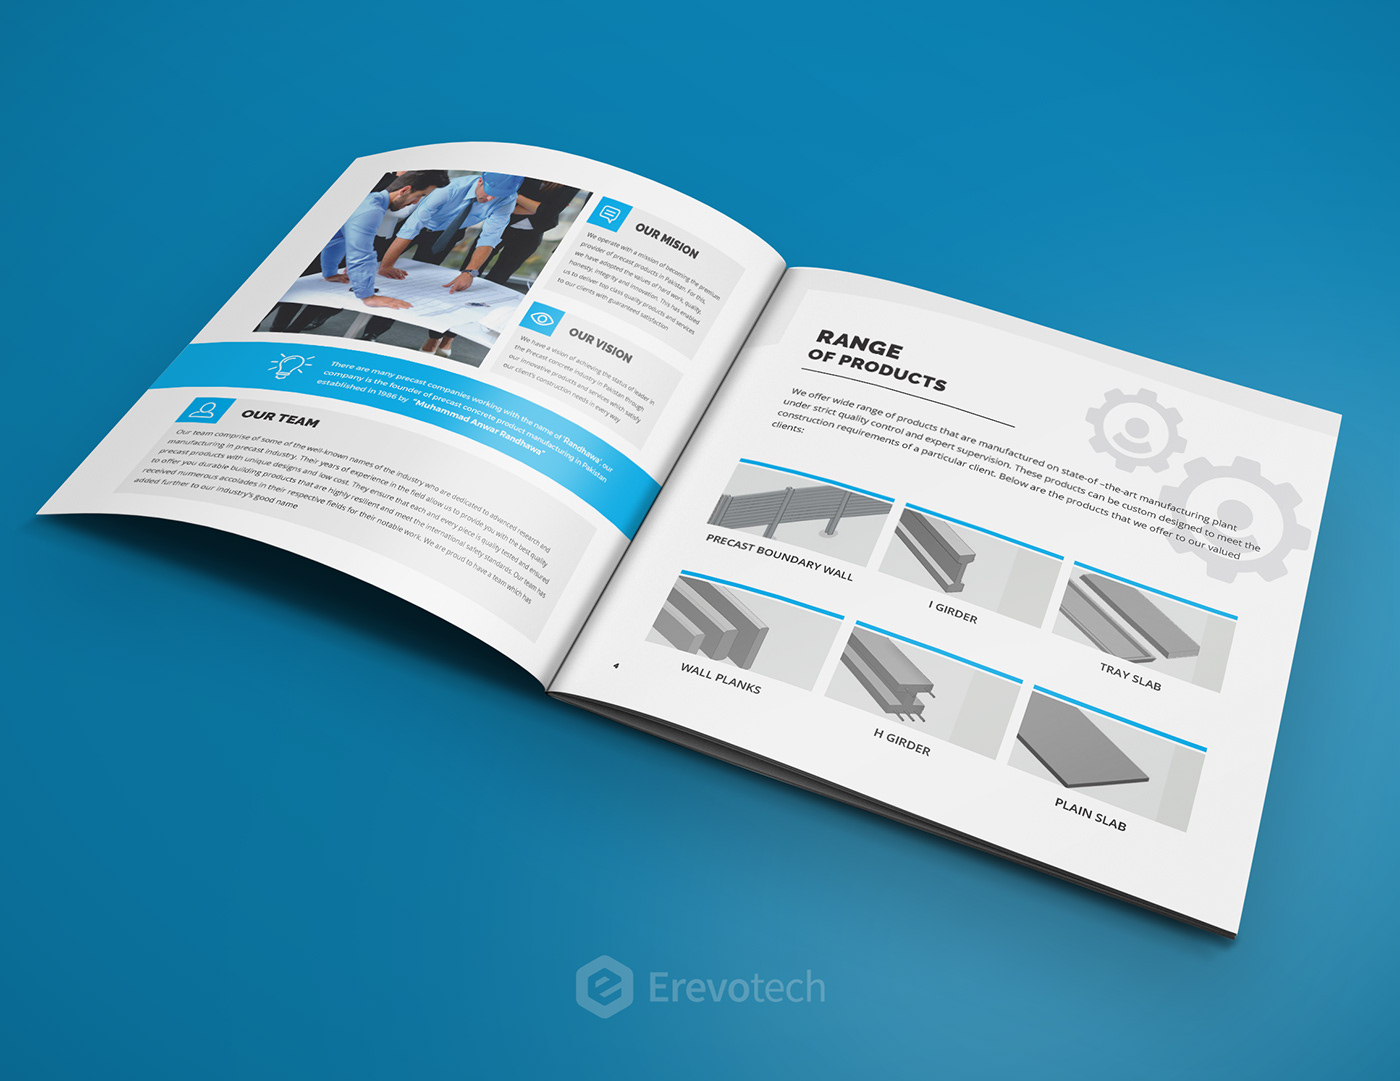 randhawa precast industry profile design